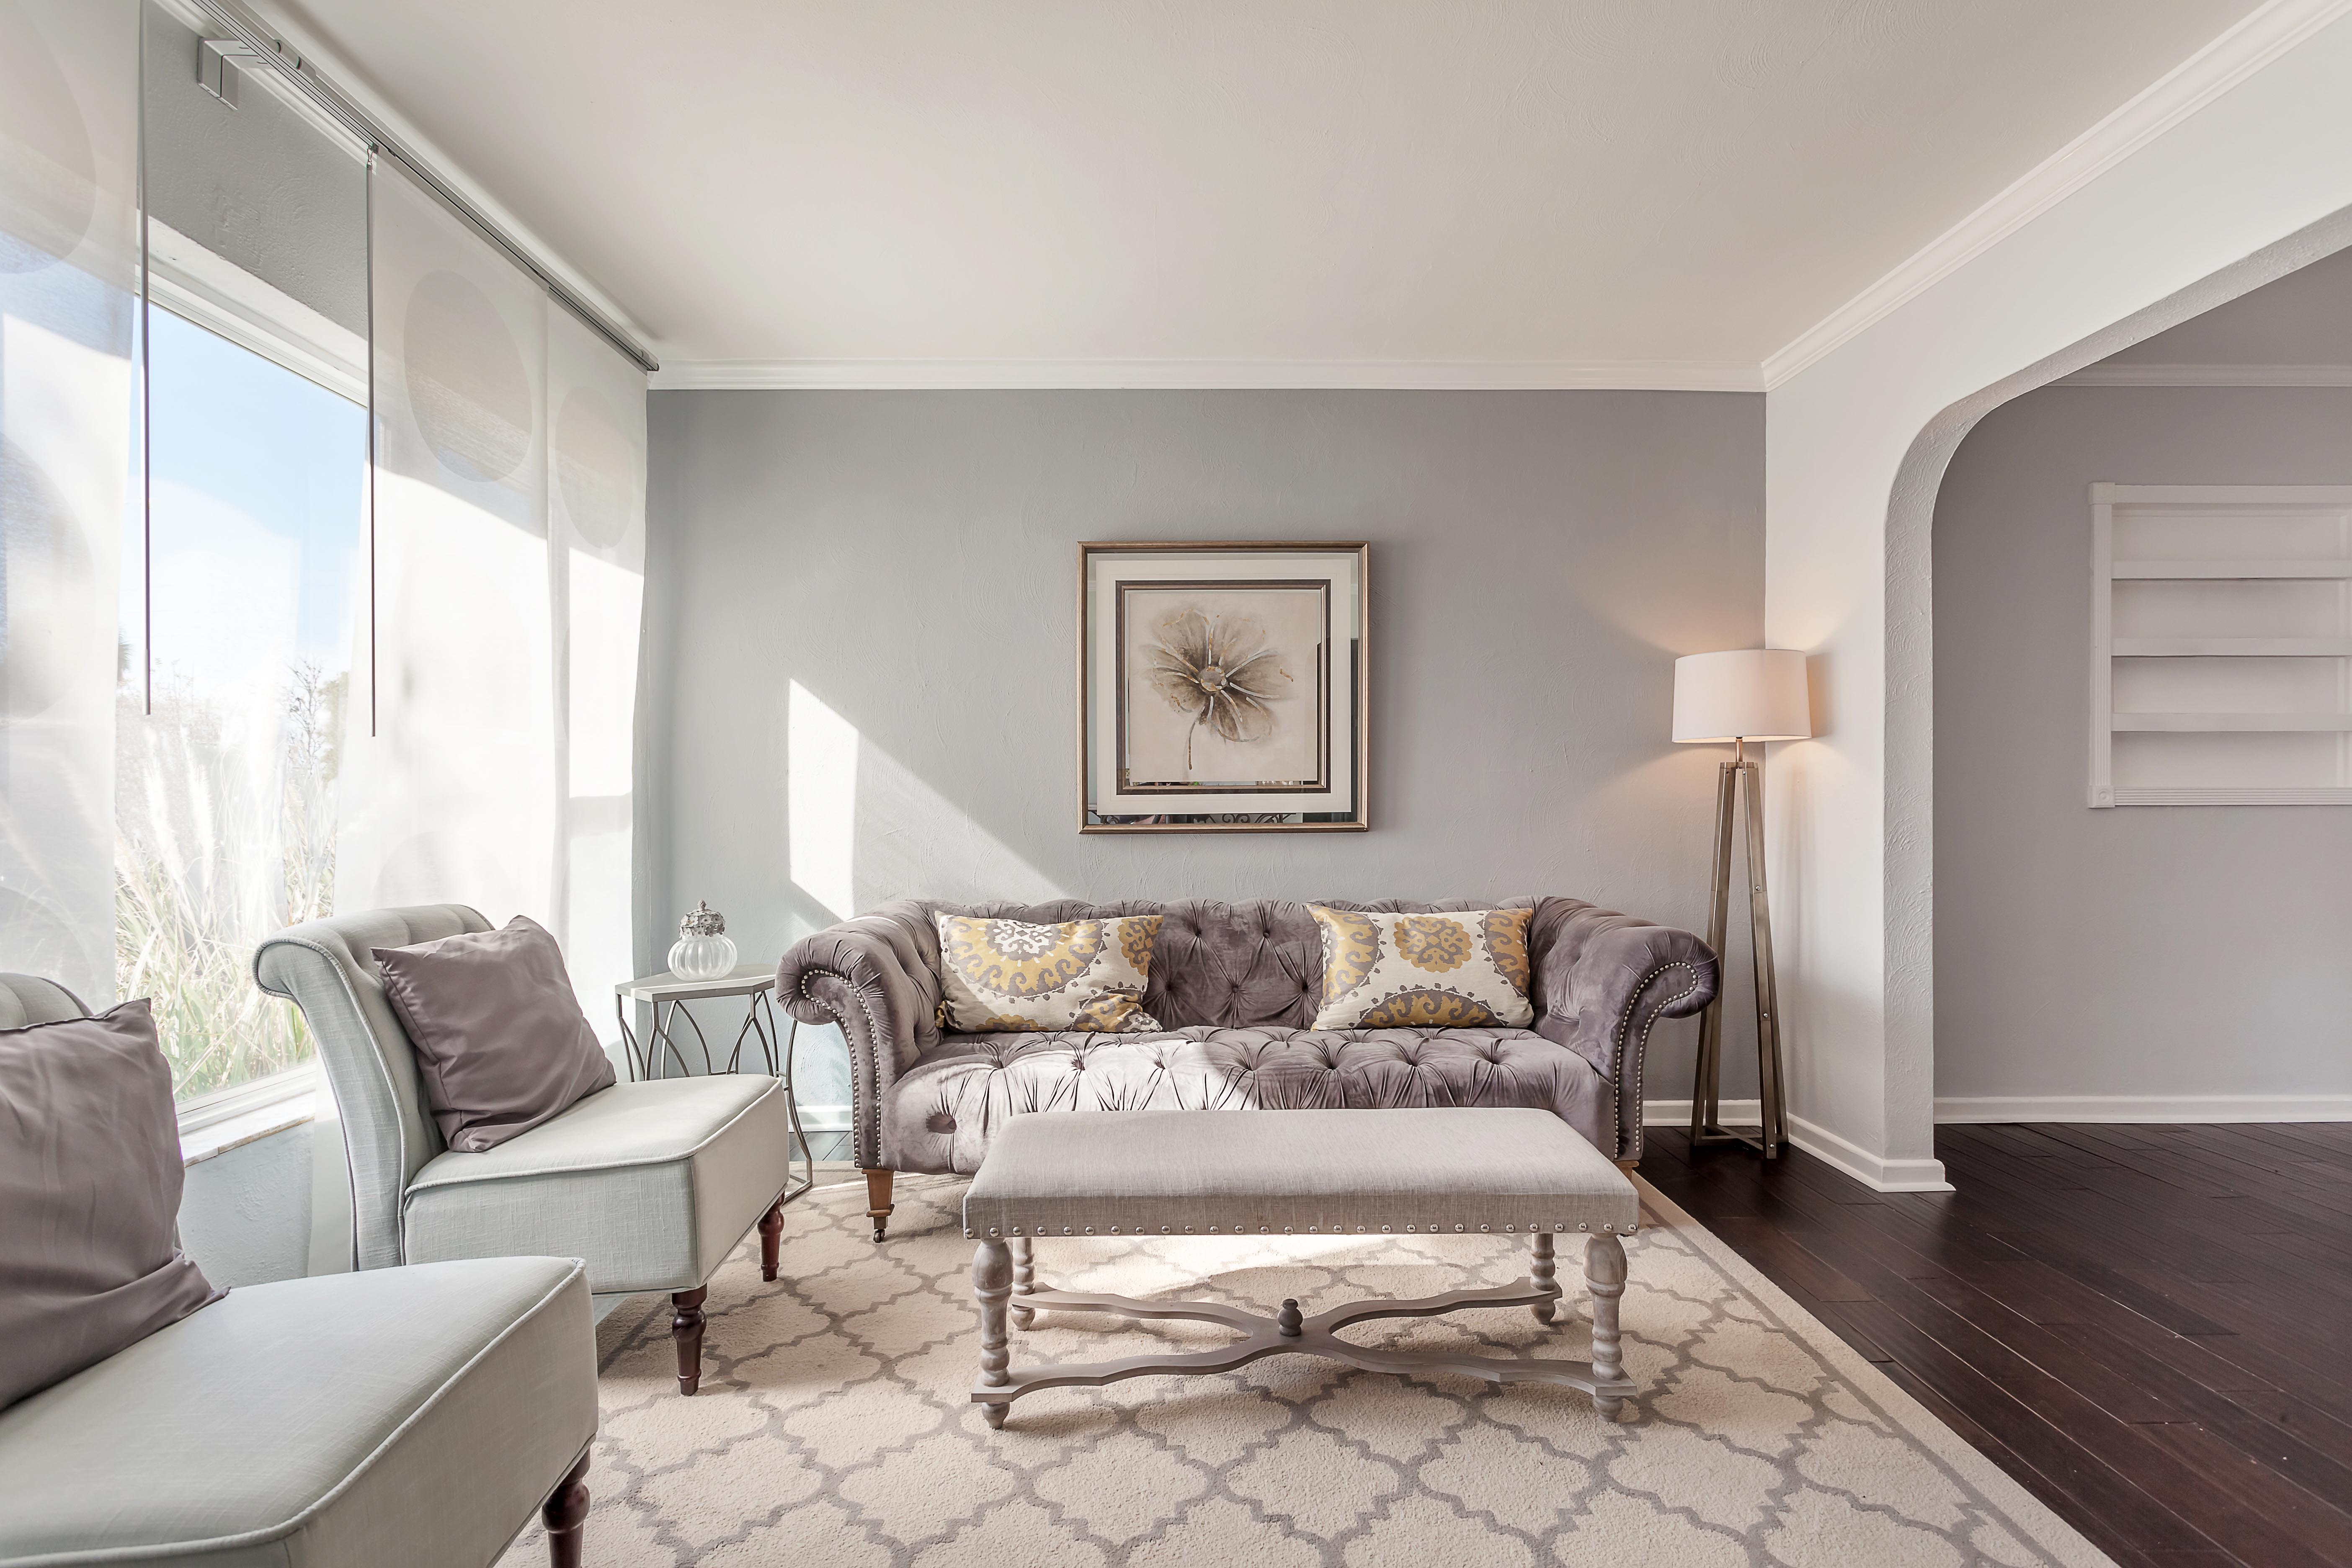 Staging Room By Room Living; Smileydot.us